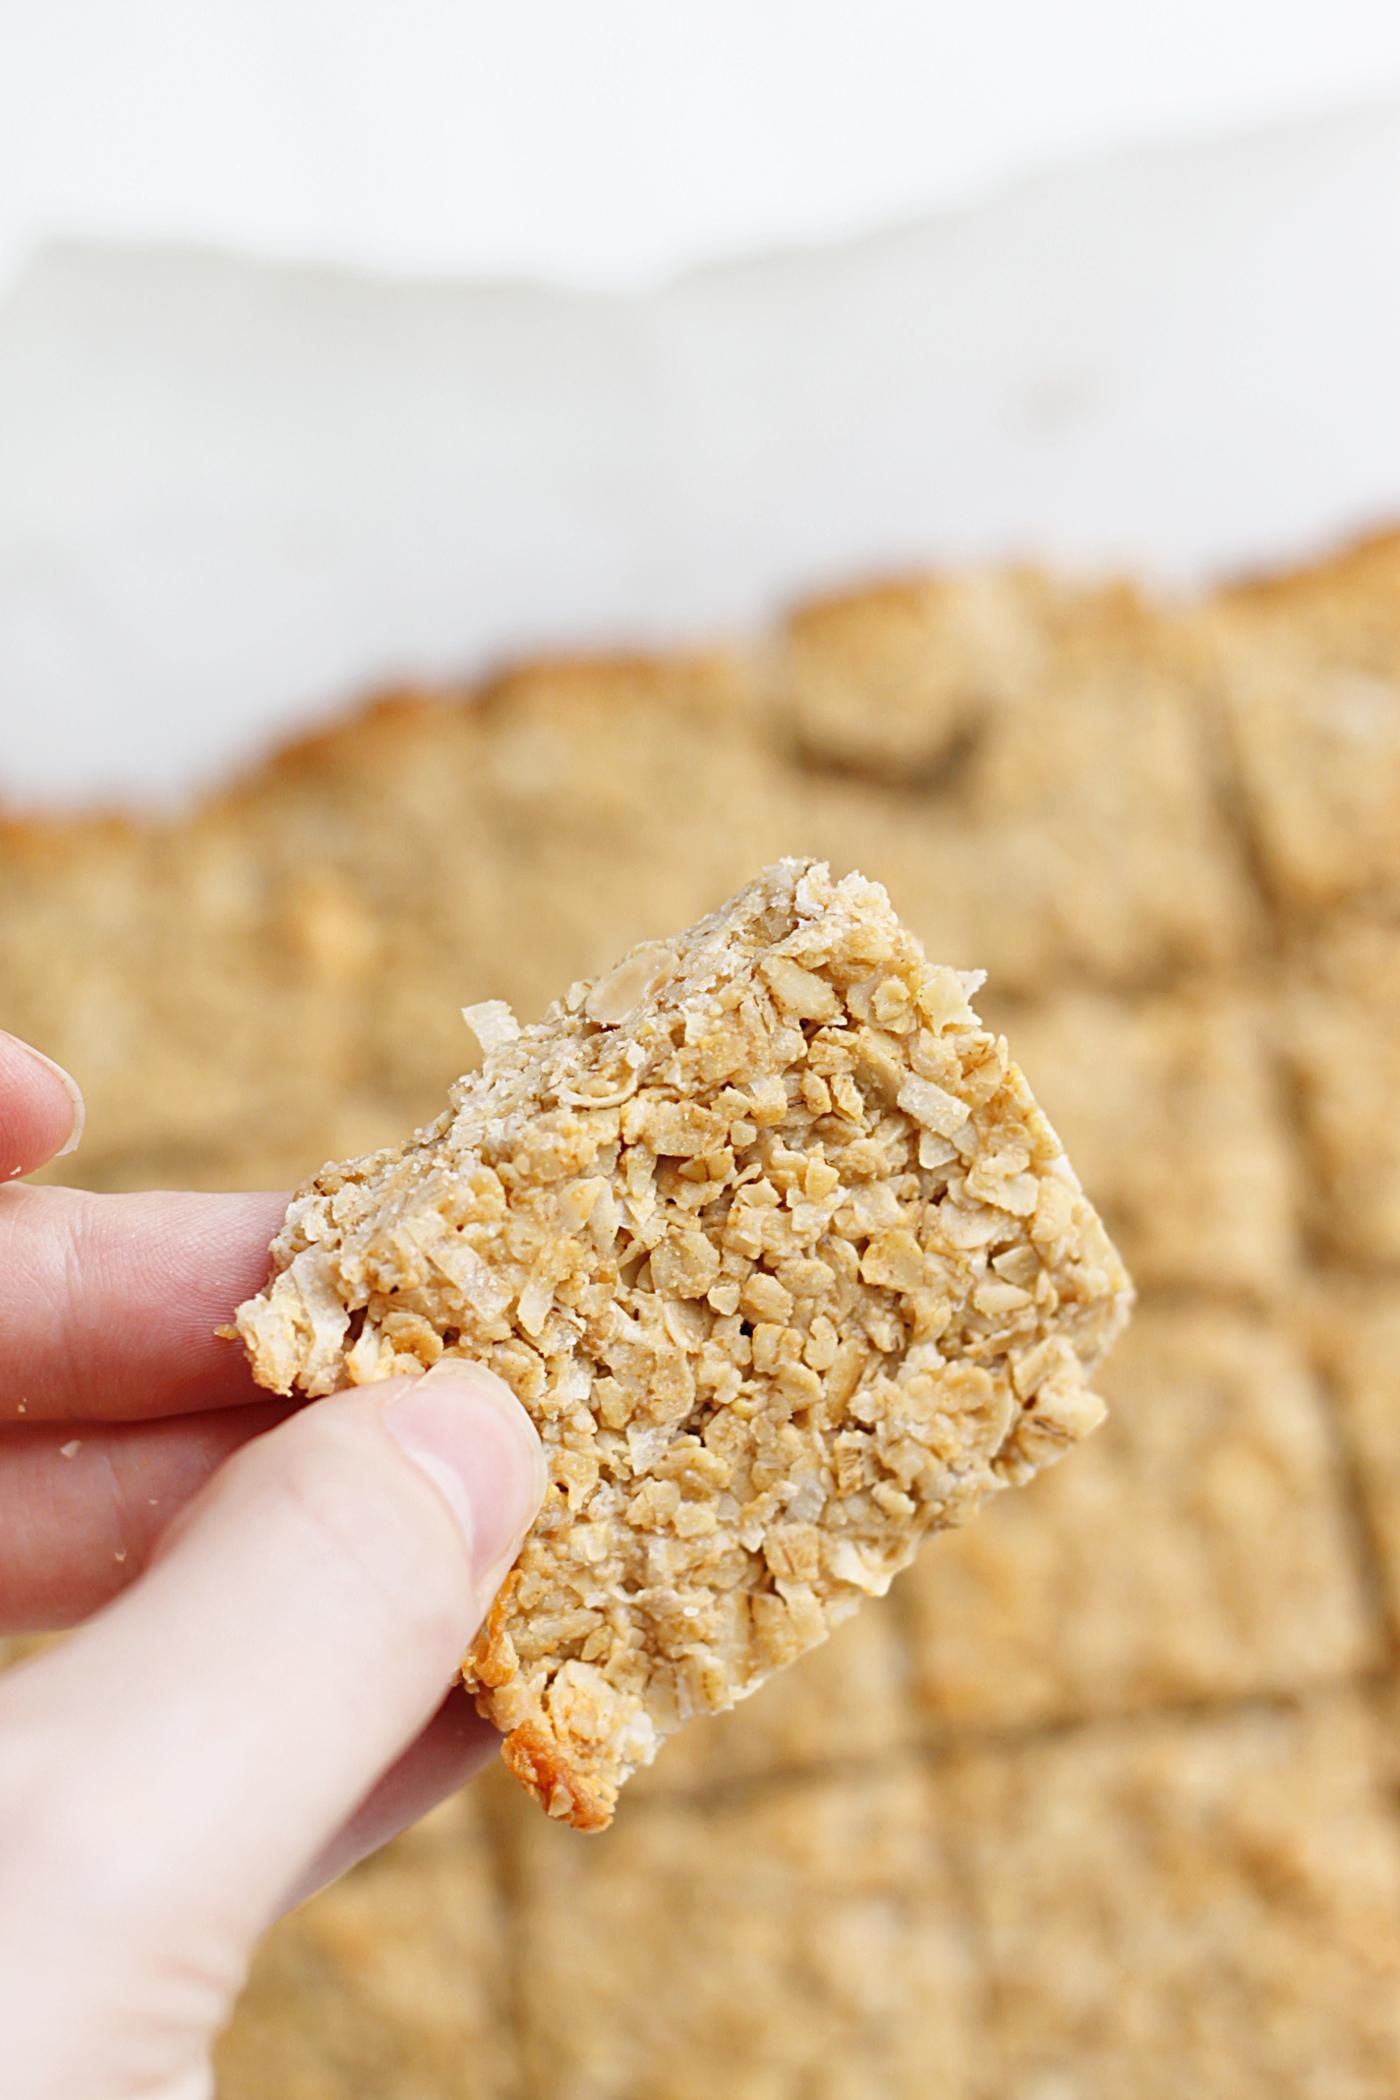 belle vie - Skinny Peanut Butter Coconut Granola Bites | Fabtastic ...